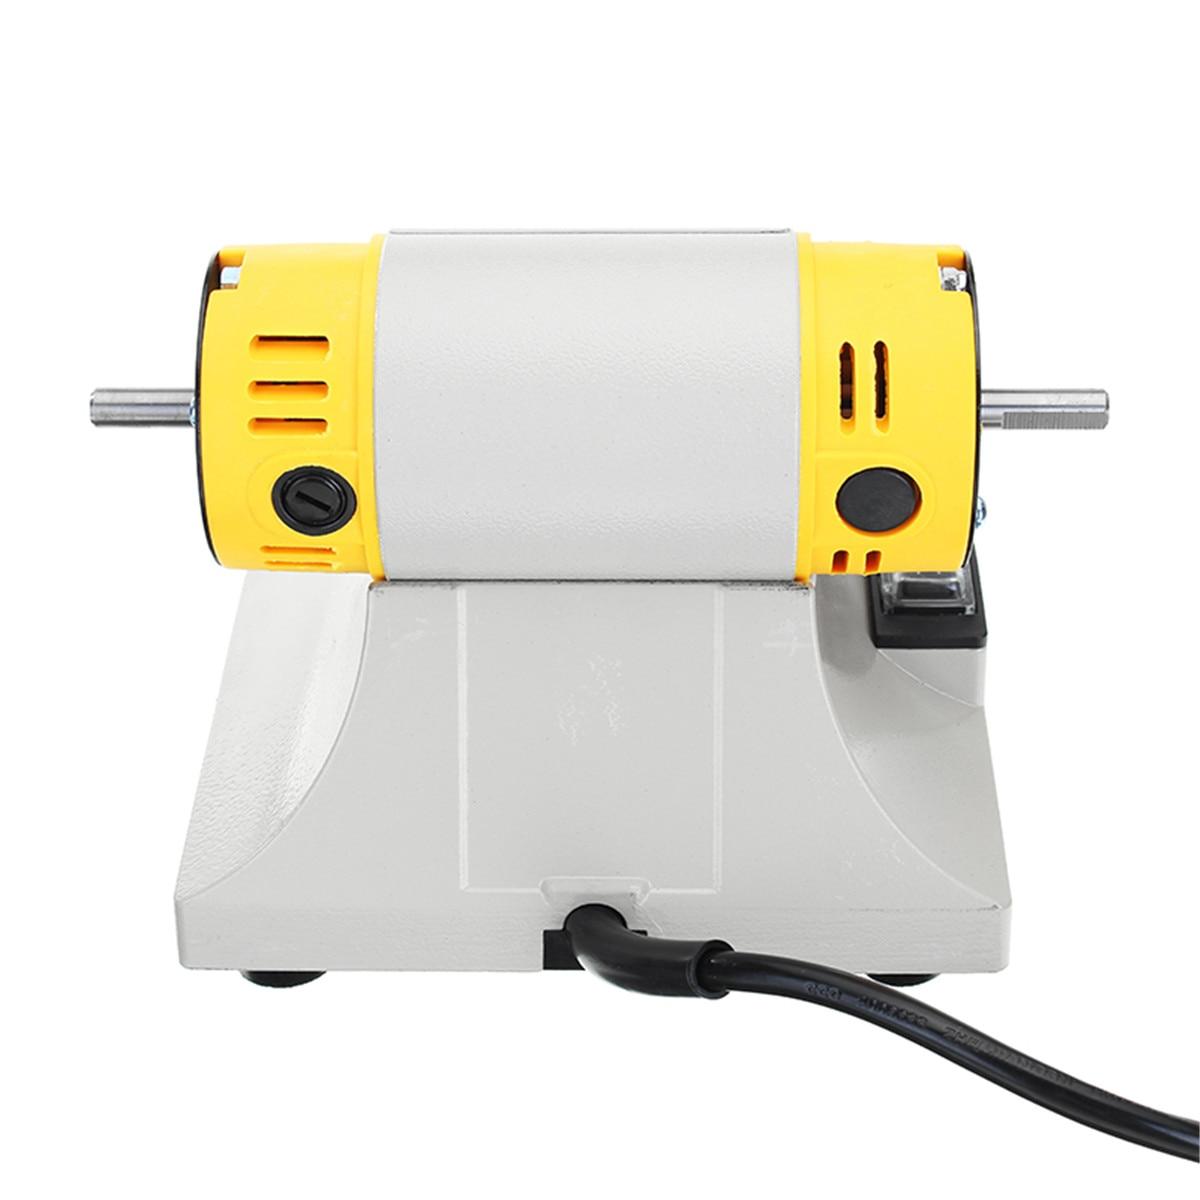 Tool US Jewelry Speed Grinder Mini Motor 350W Machine Lathe Bench For Adjustable Polisher EU Plug Polishing Kit